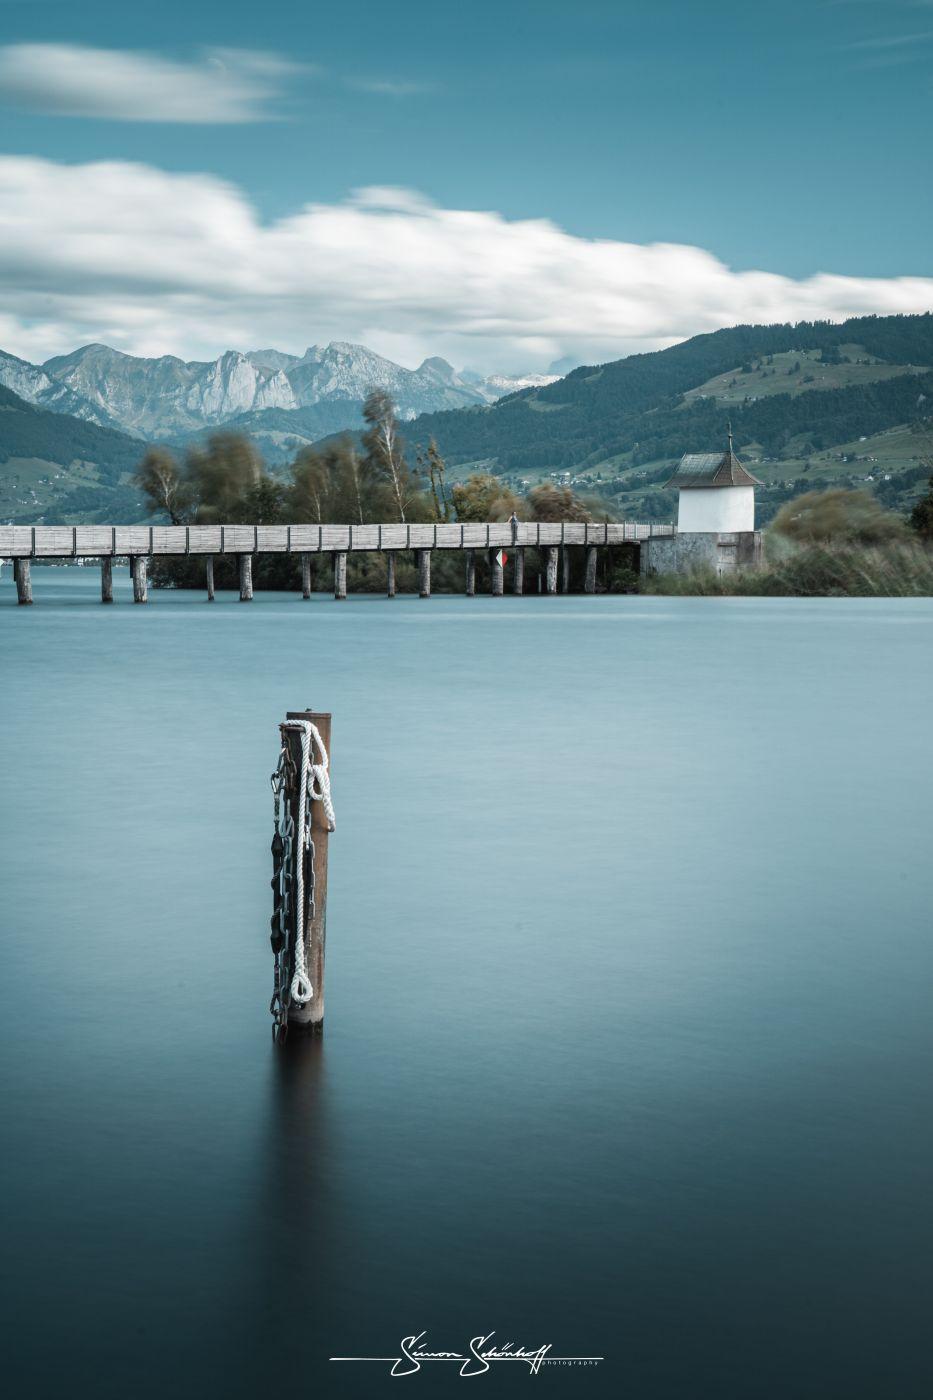 View of the woden bridge, Switzerland